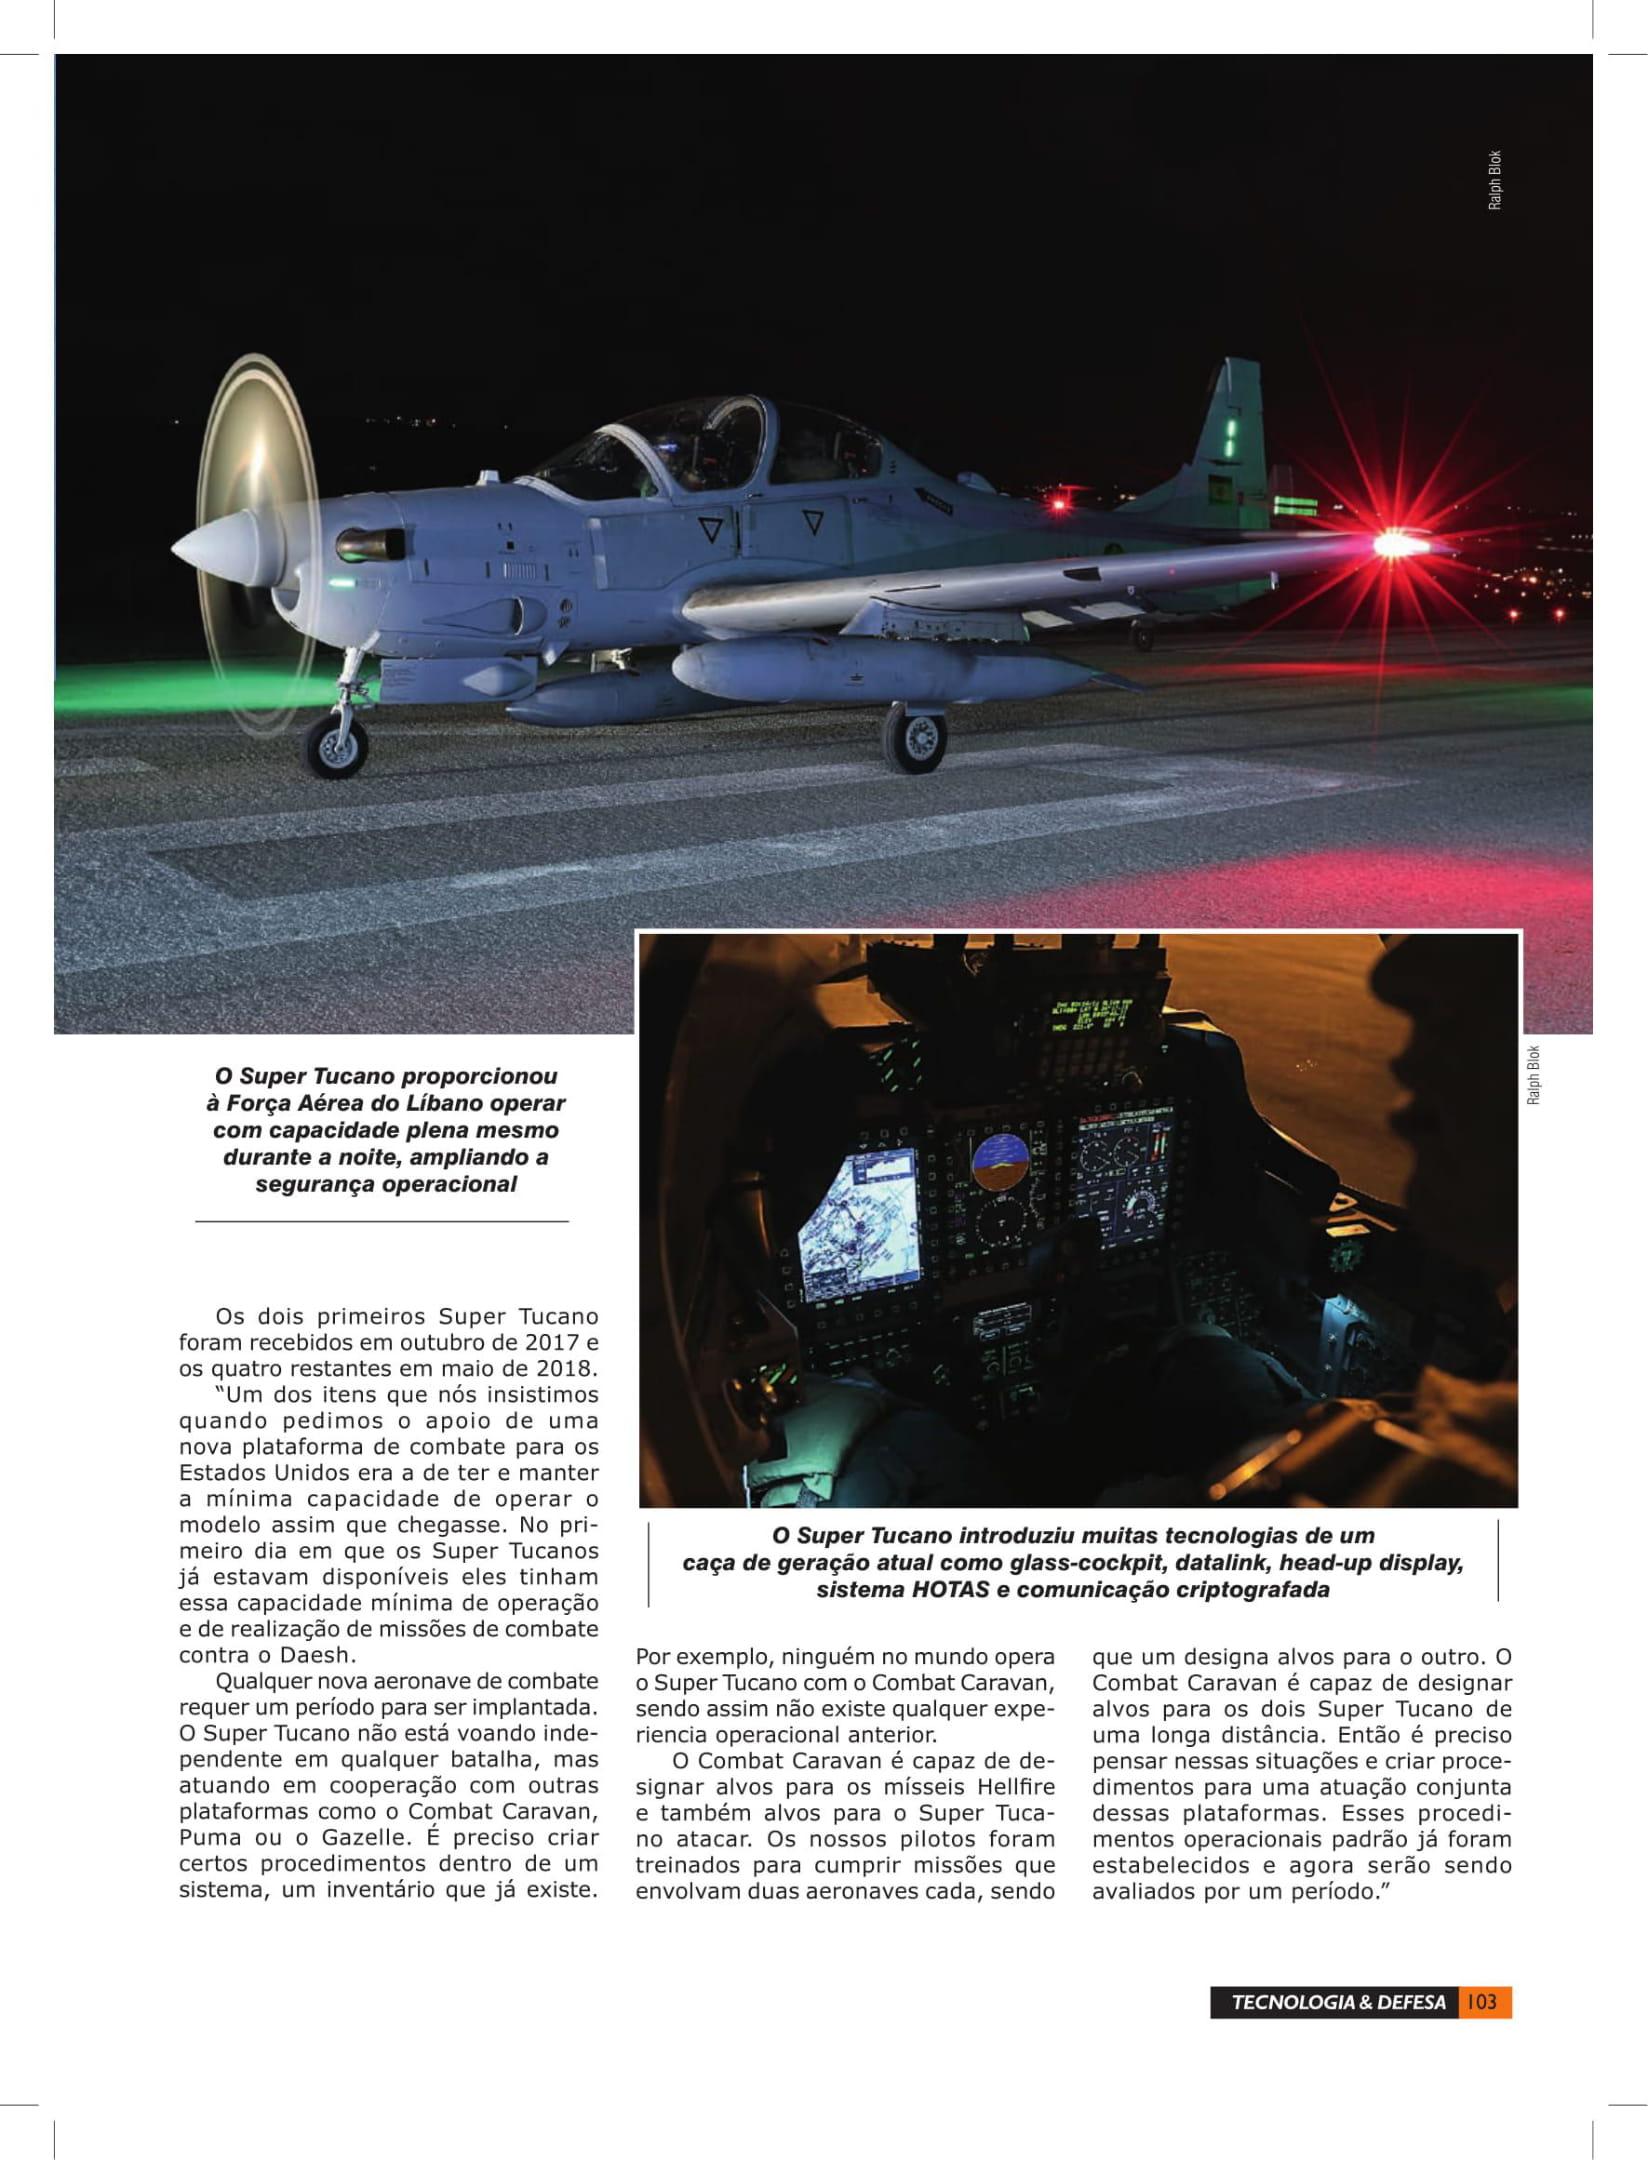 Tecnologia & Defesa (Brazil)_Lebanese Air Force-7